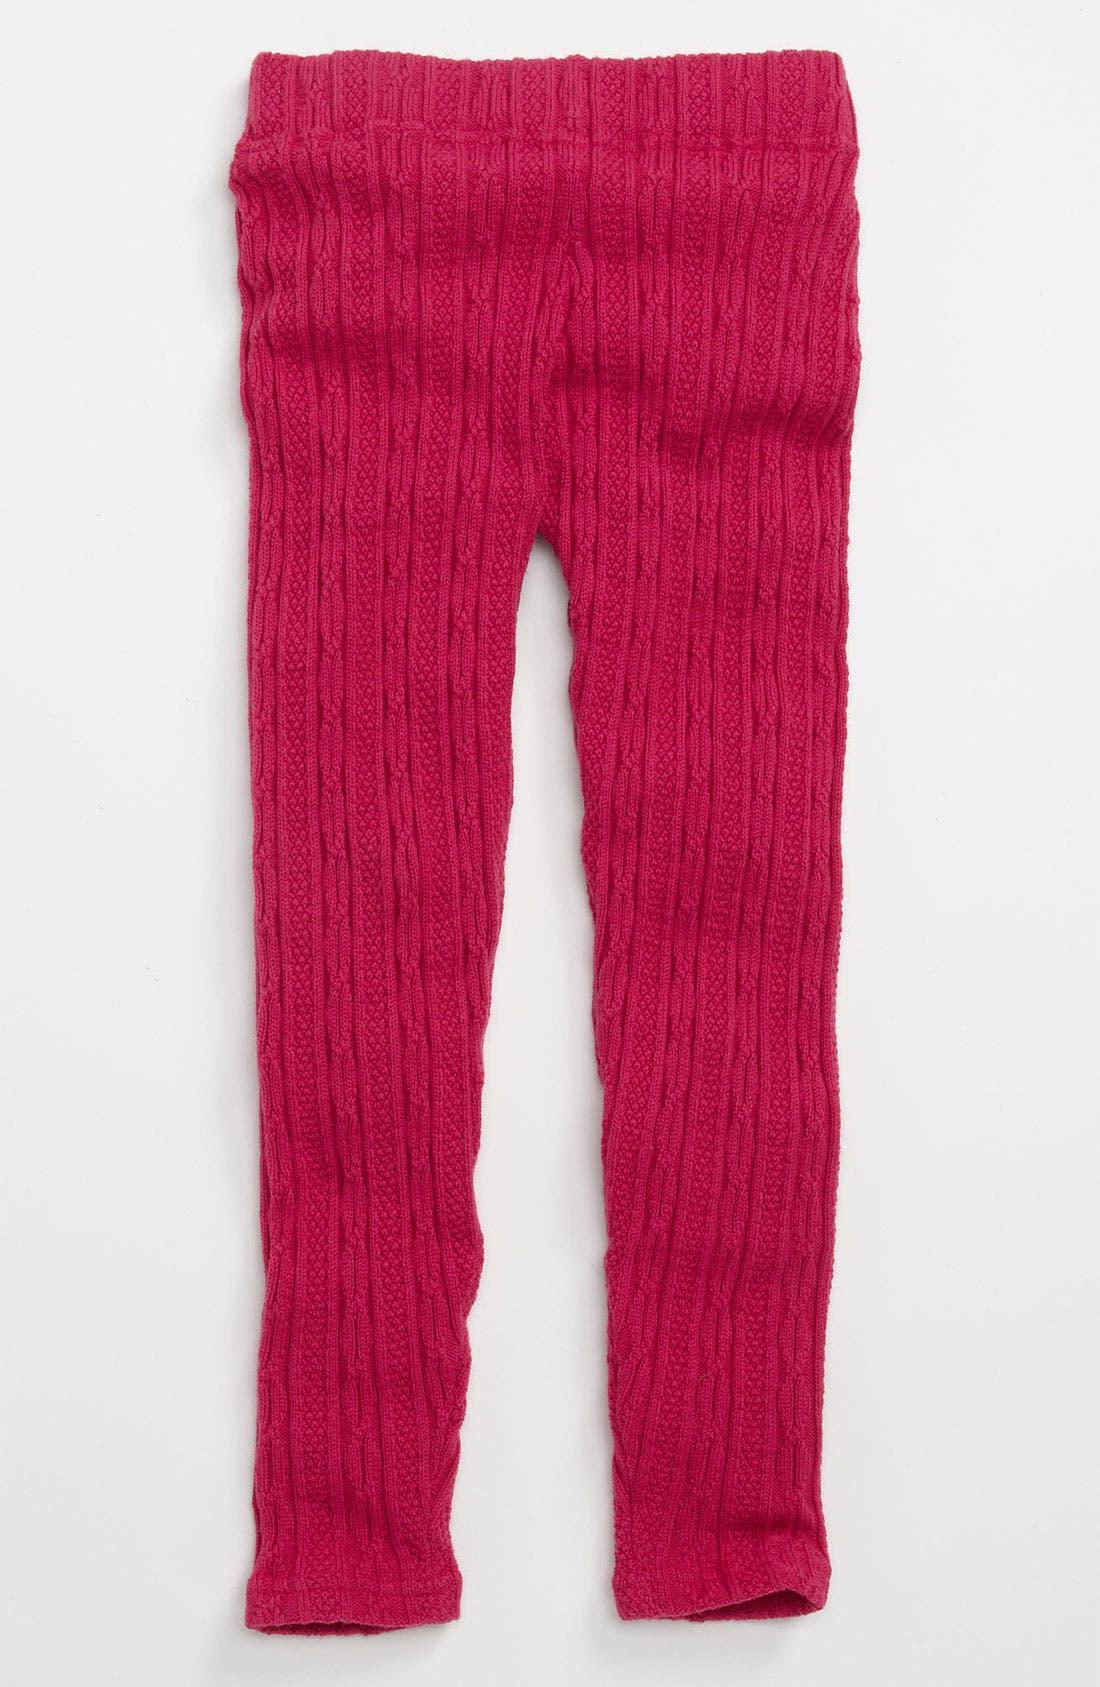 Main Image - Tucker + Tate 'Johanna' Cable Knit Leggings (Little Girls)